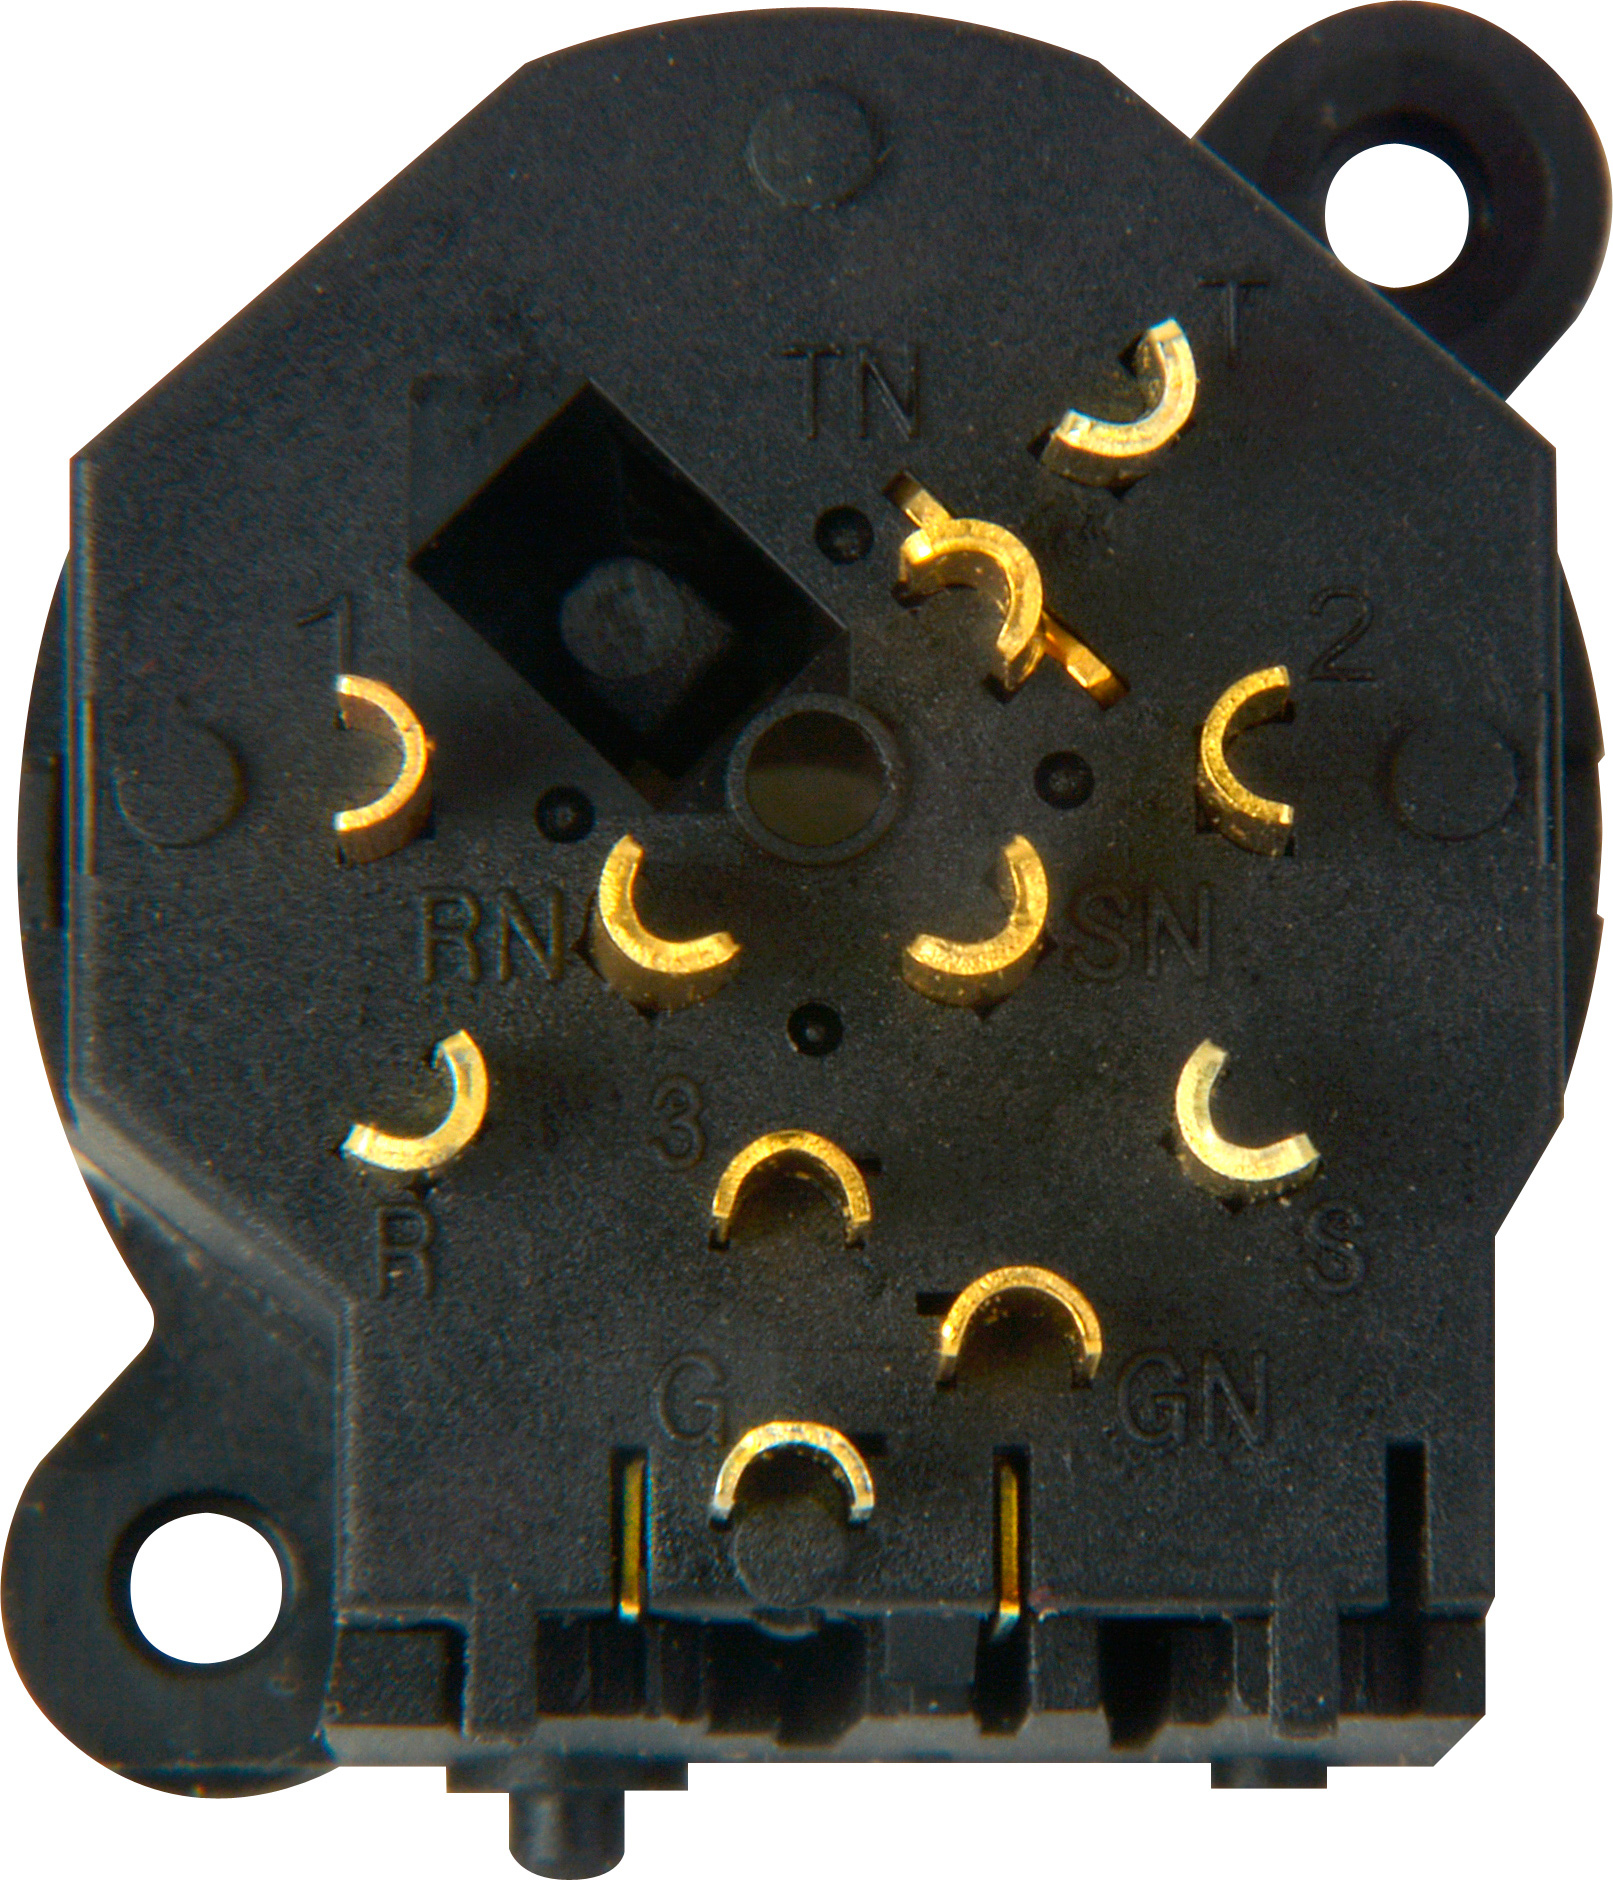 neutrik ncj10fi s combo 3 pin xlr 1 4 inch stereo w switching ground. Black Bedroom Furniture Sets. Home Design Ideas